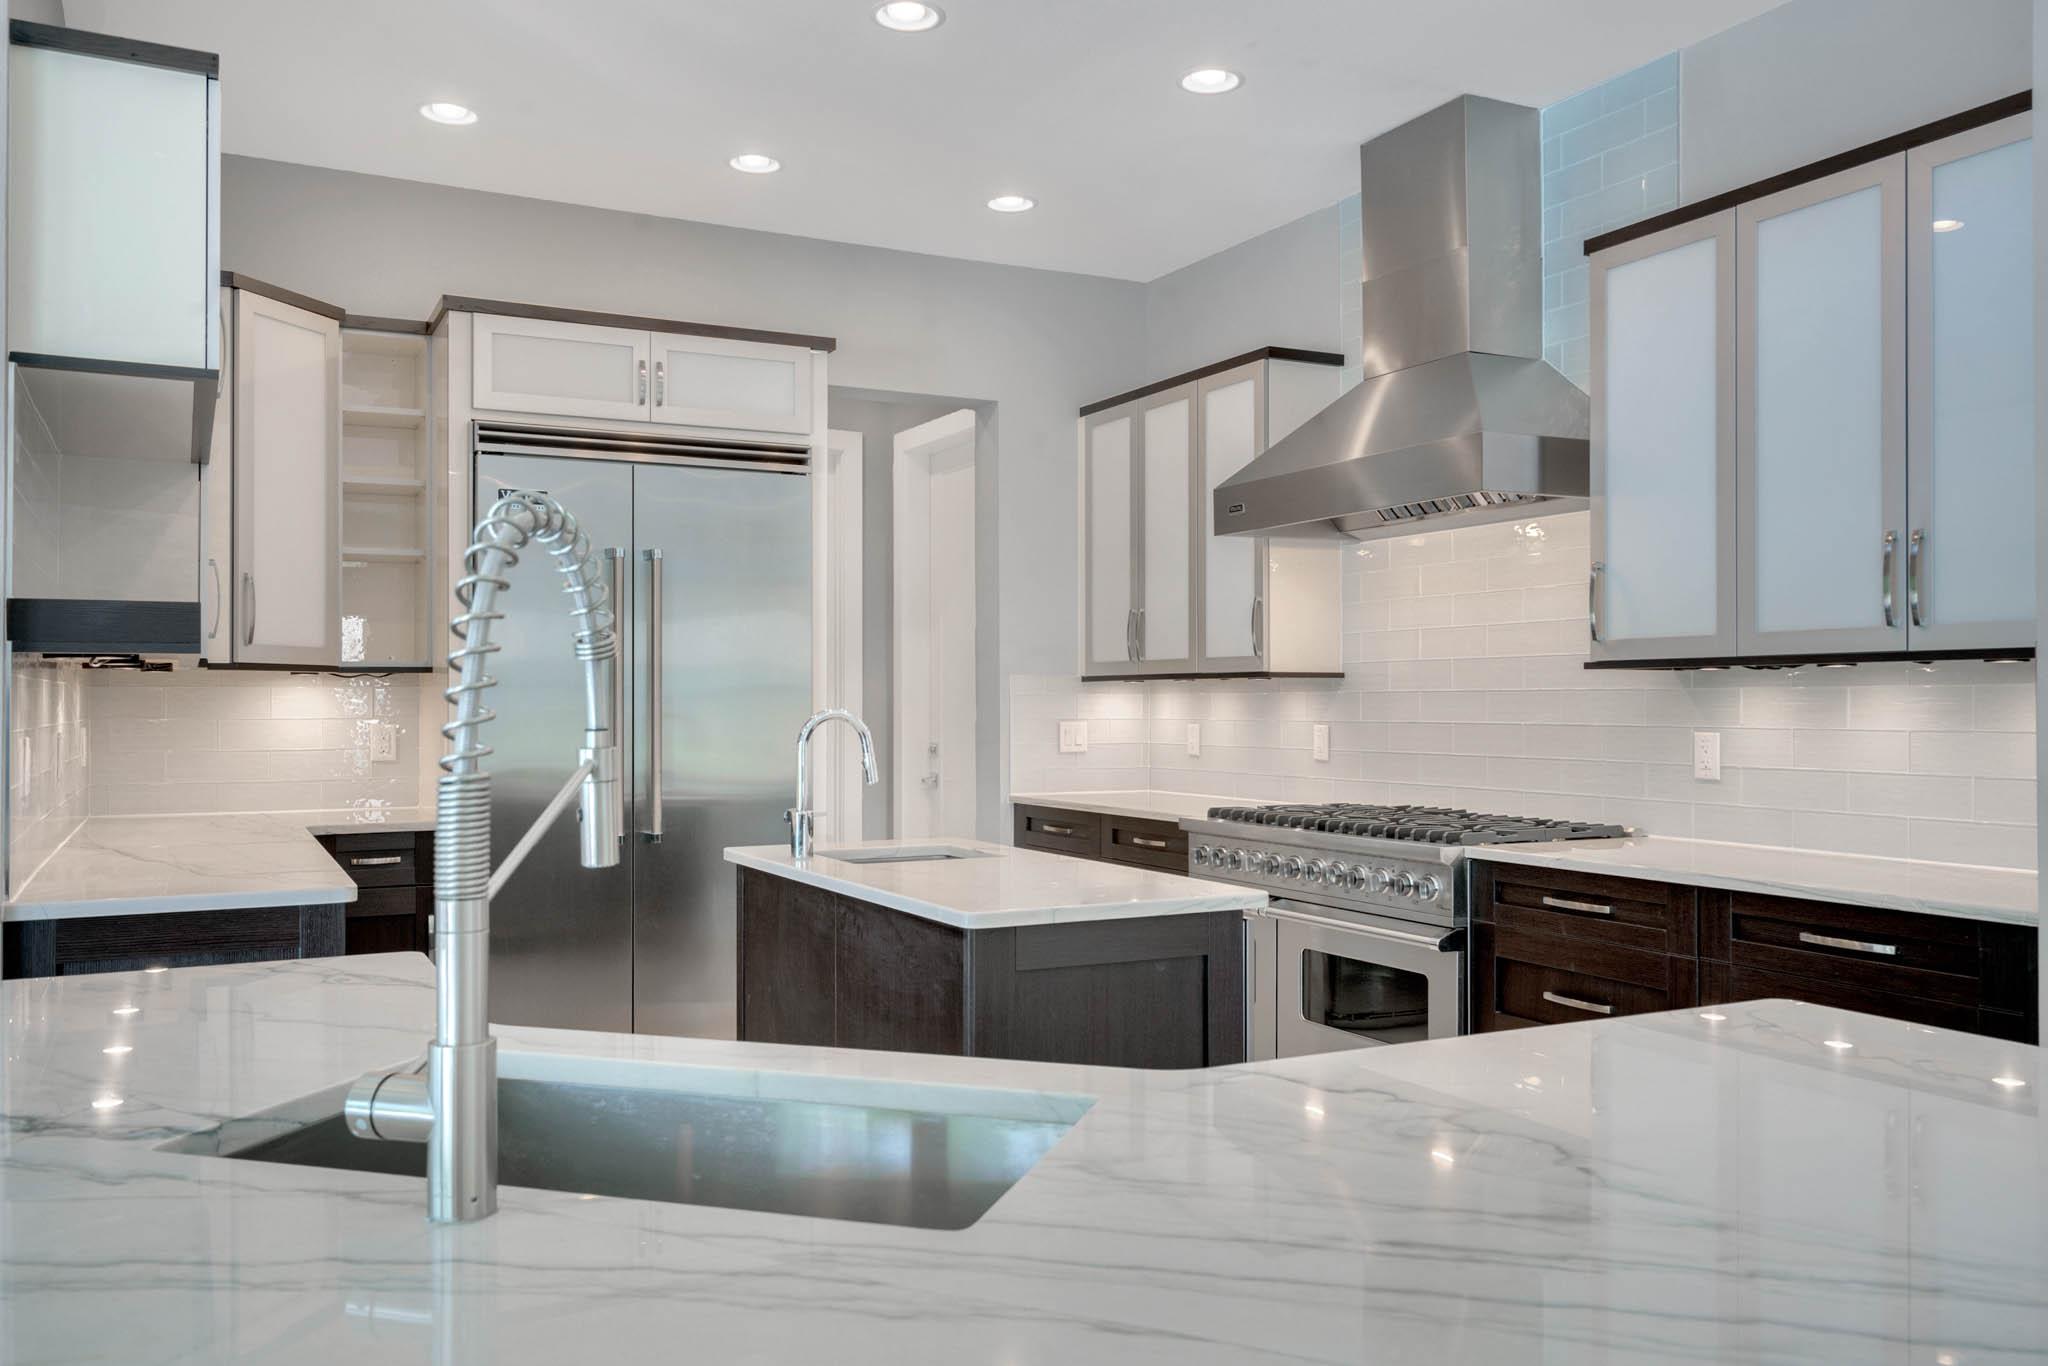 Affordable lake nona homes modern luxury home designs for Interior designer milano